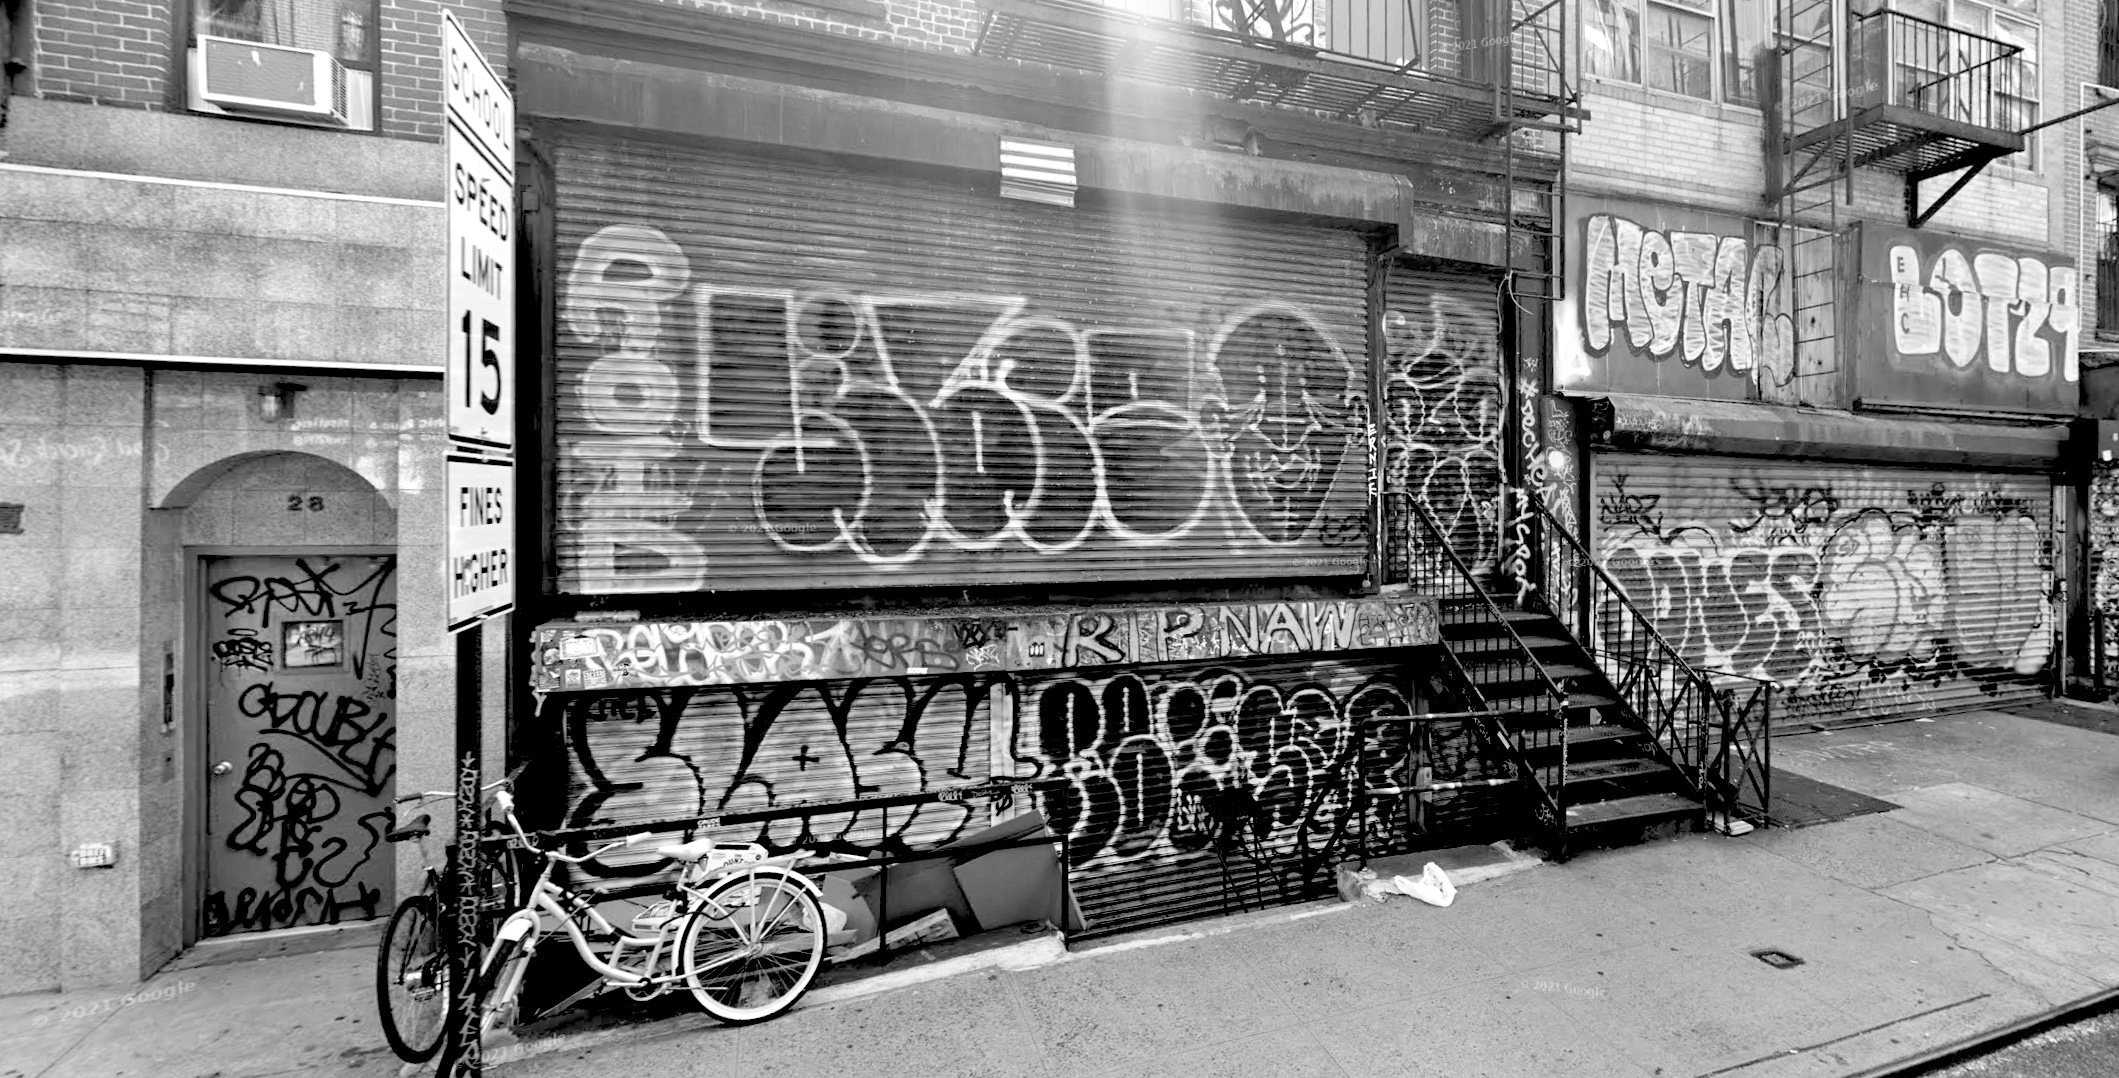 graffiti near school in New York